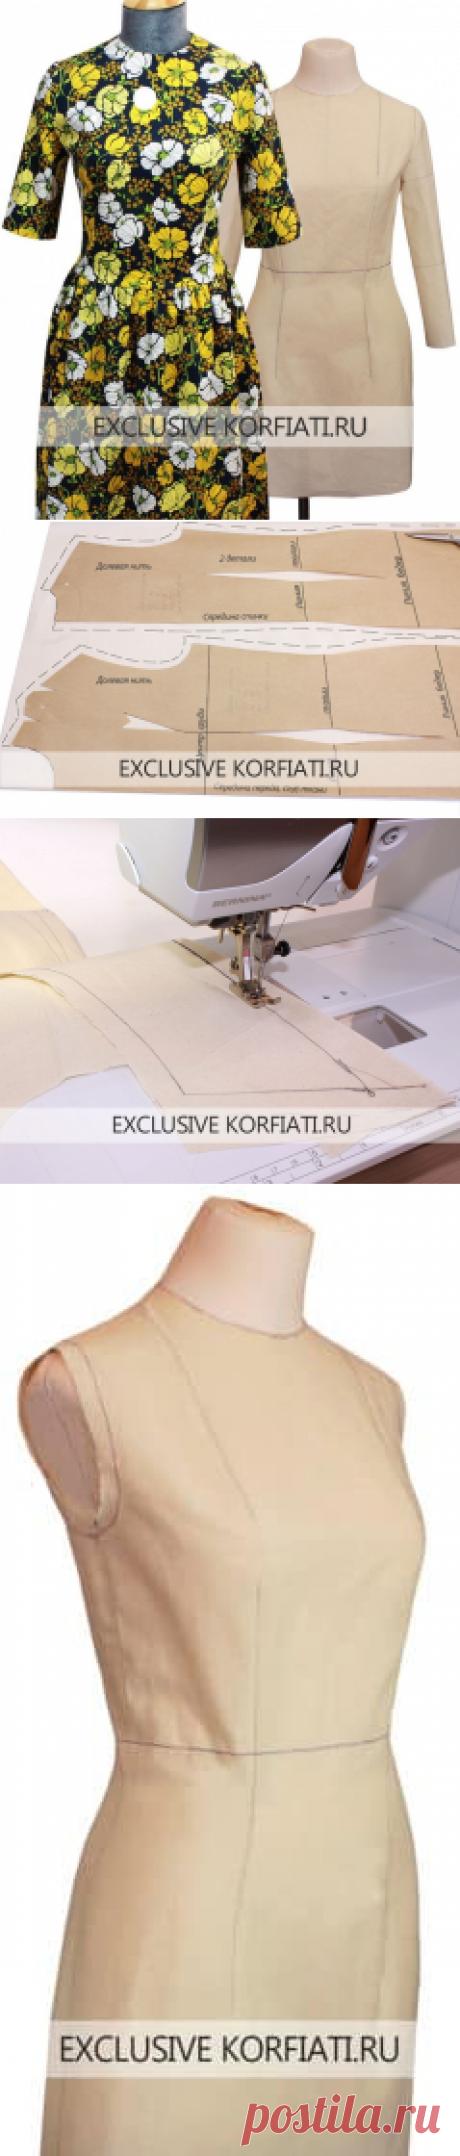 How to sew a product sampler - Anastasia Korfiati's master class